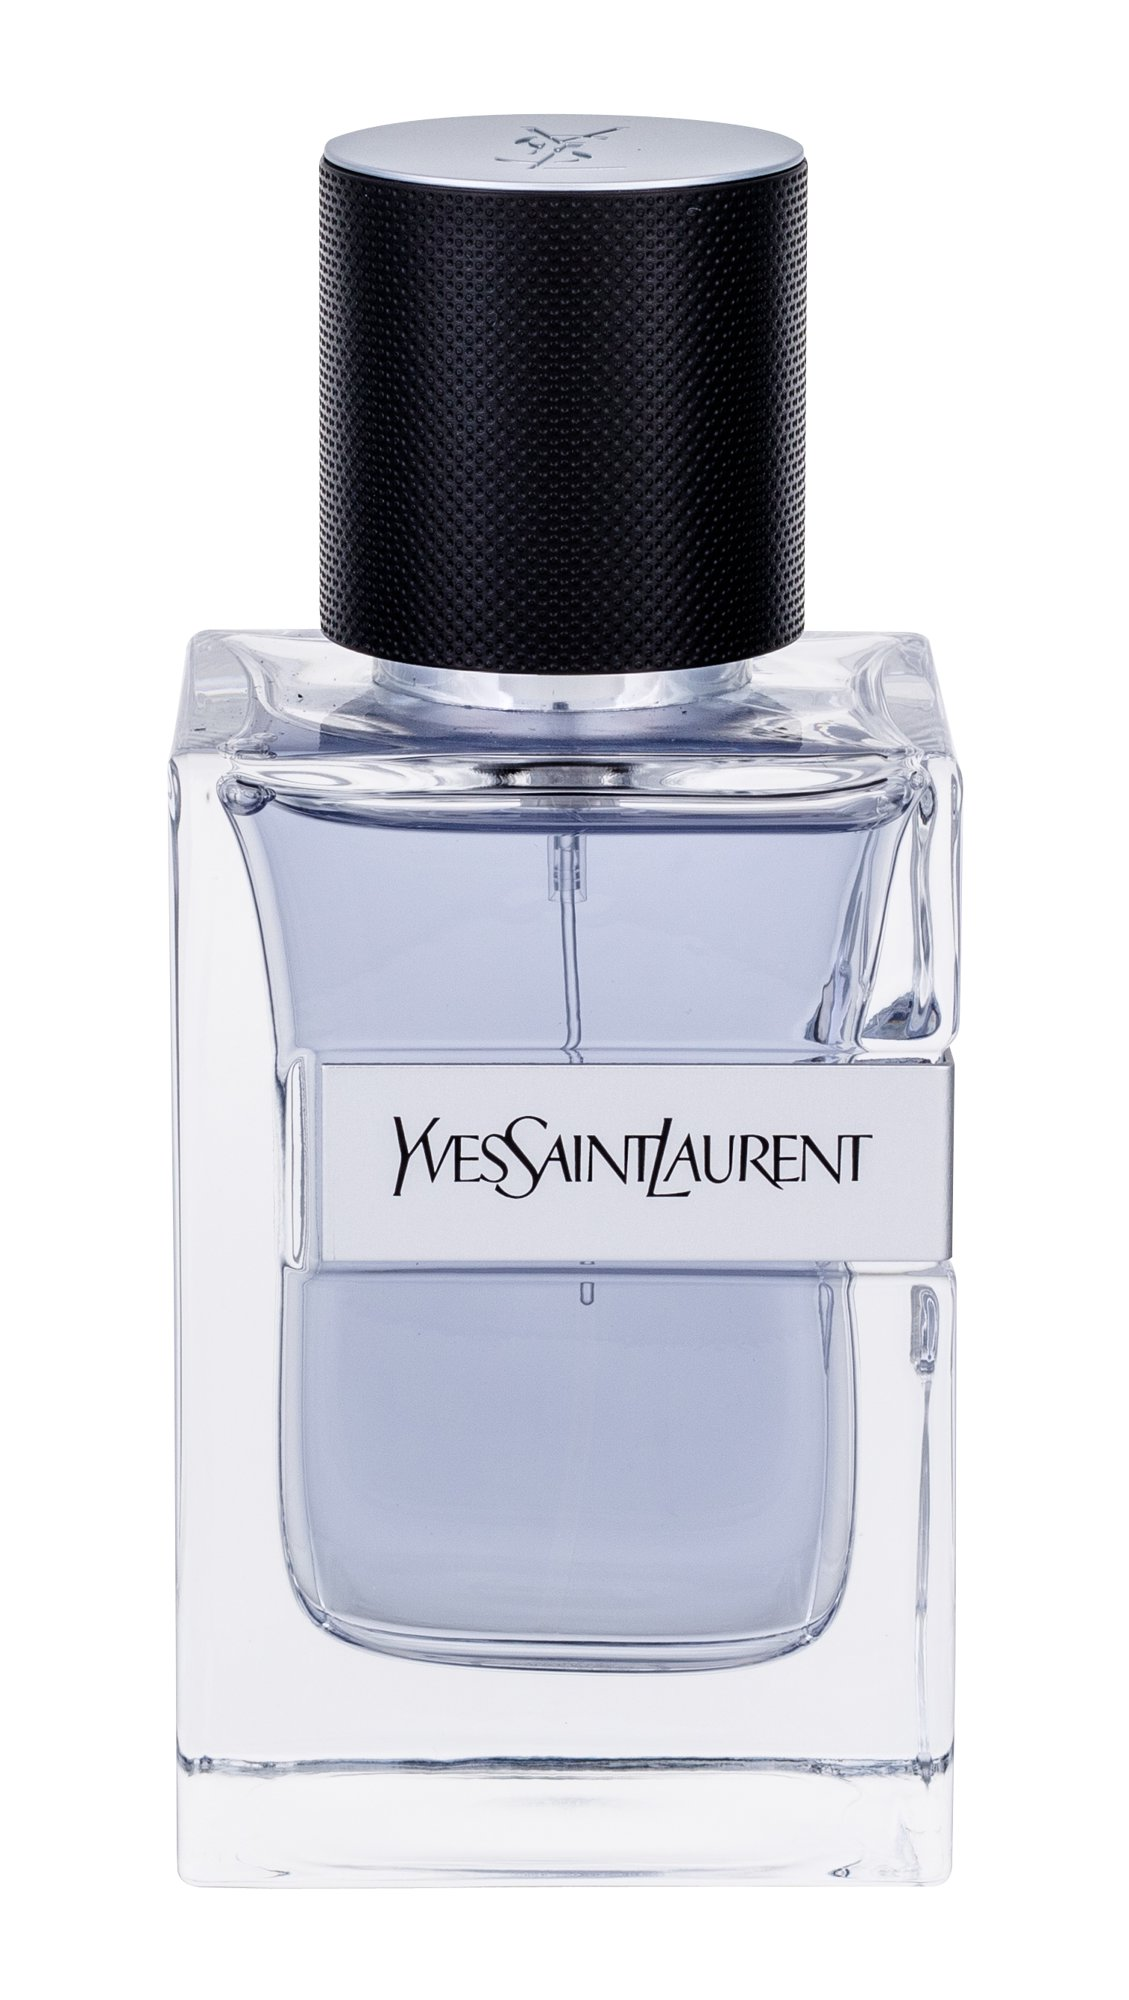 Yves Saint Laurent Y, Toaletná voda 60ml